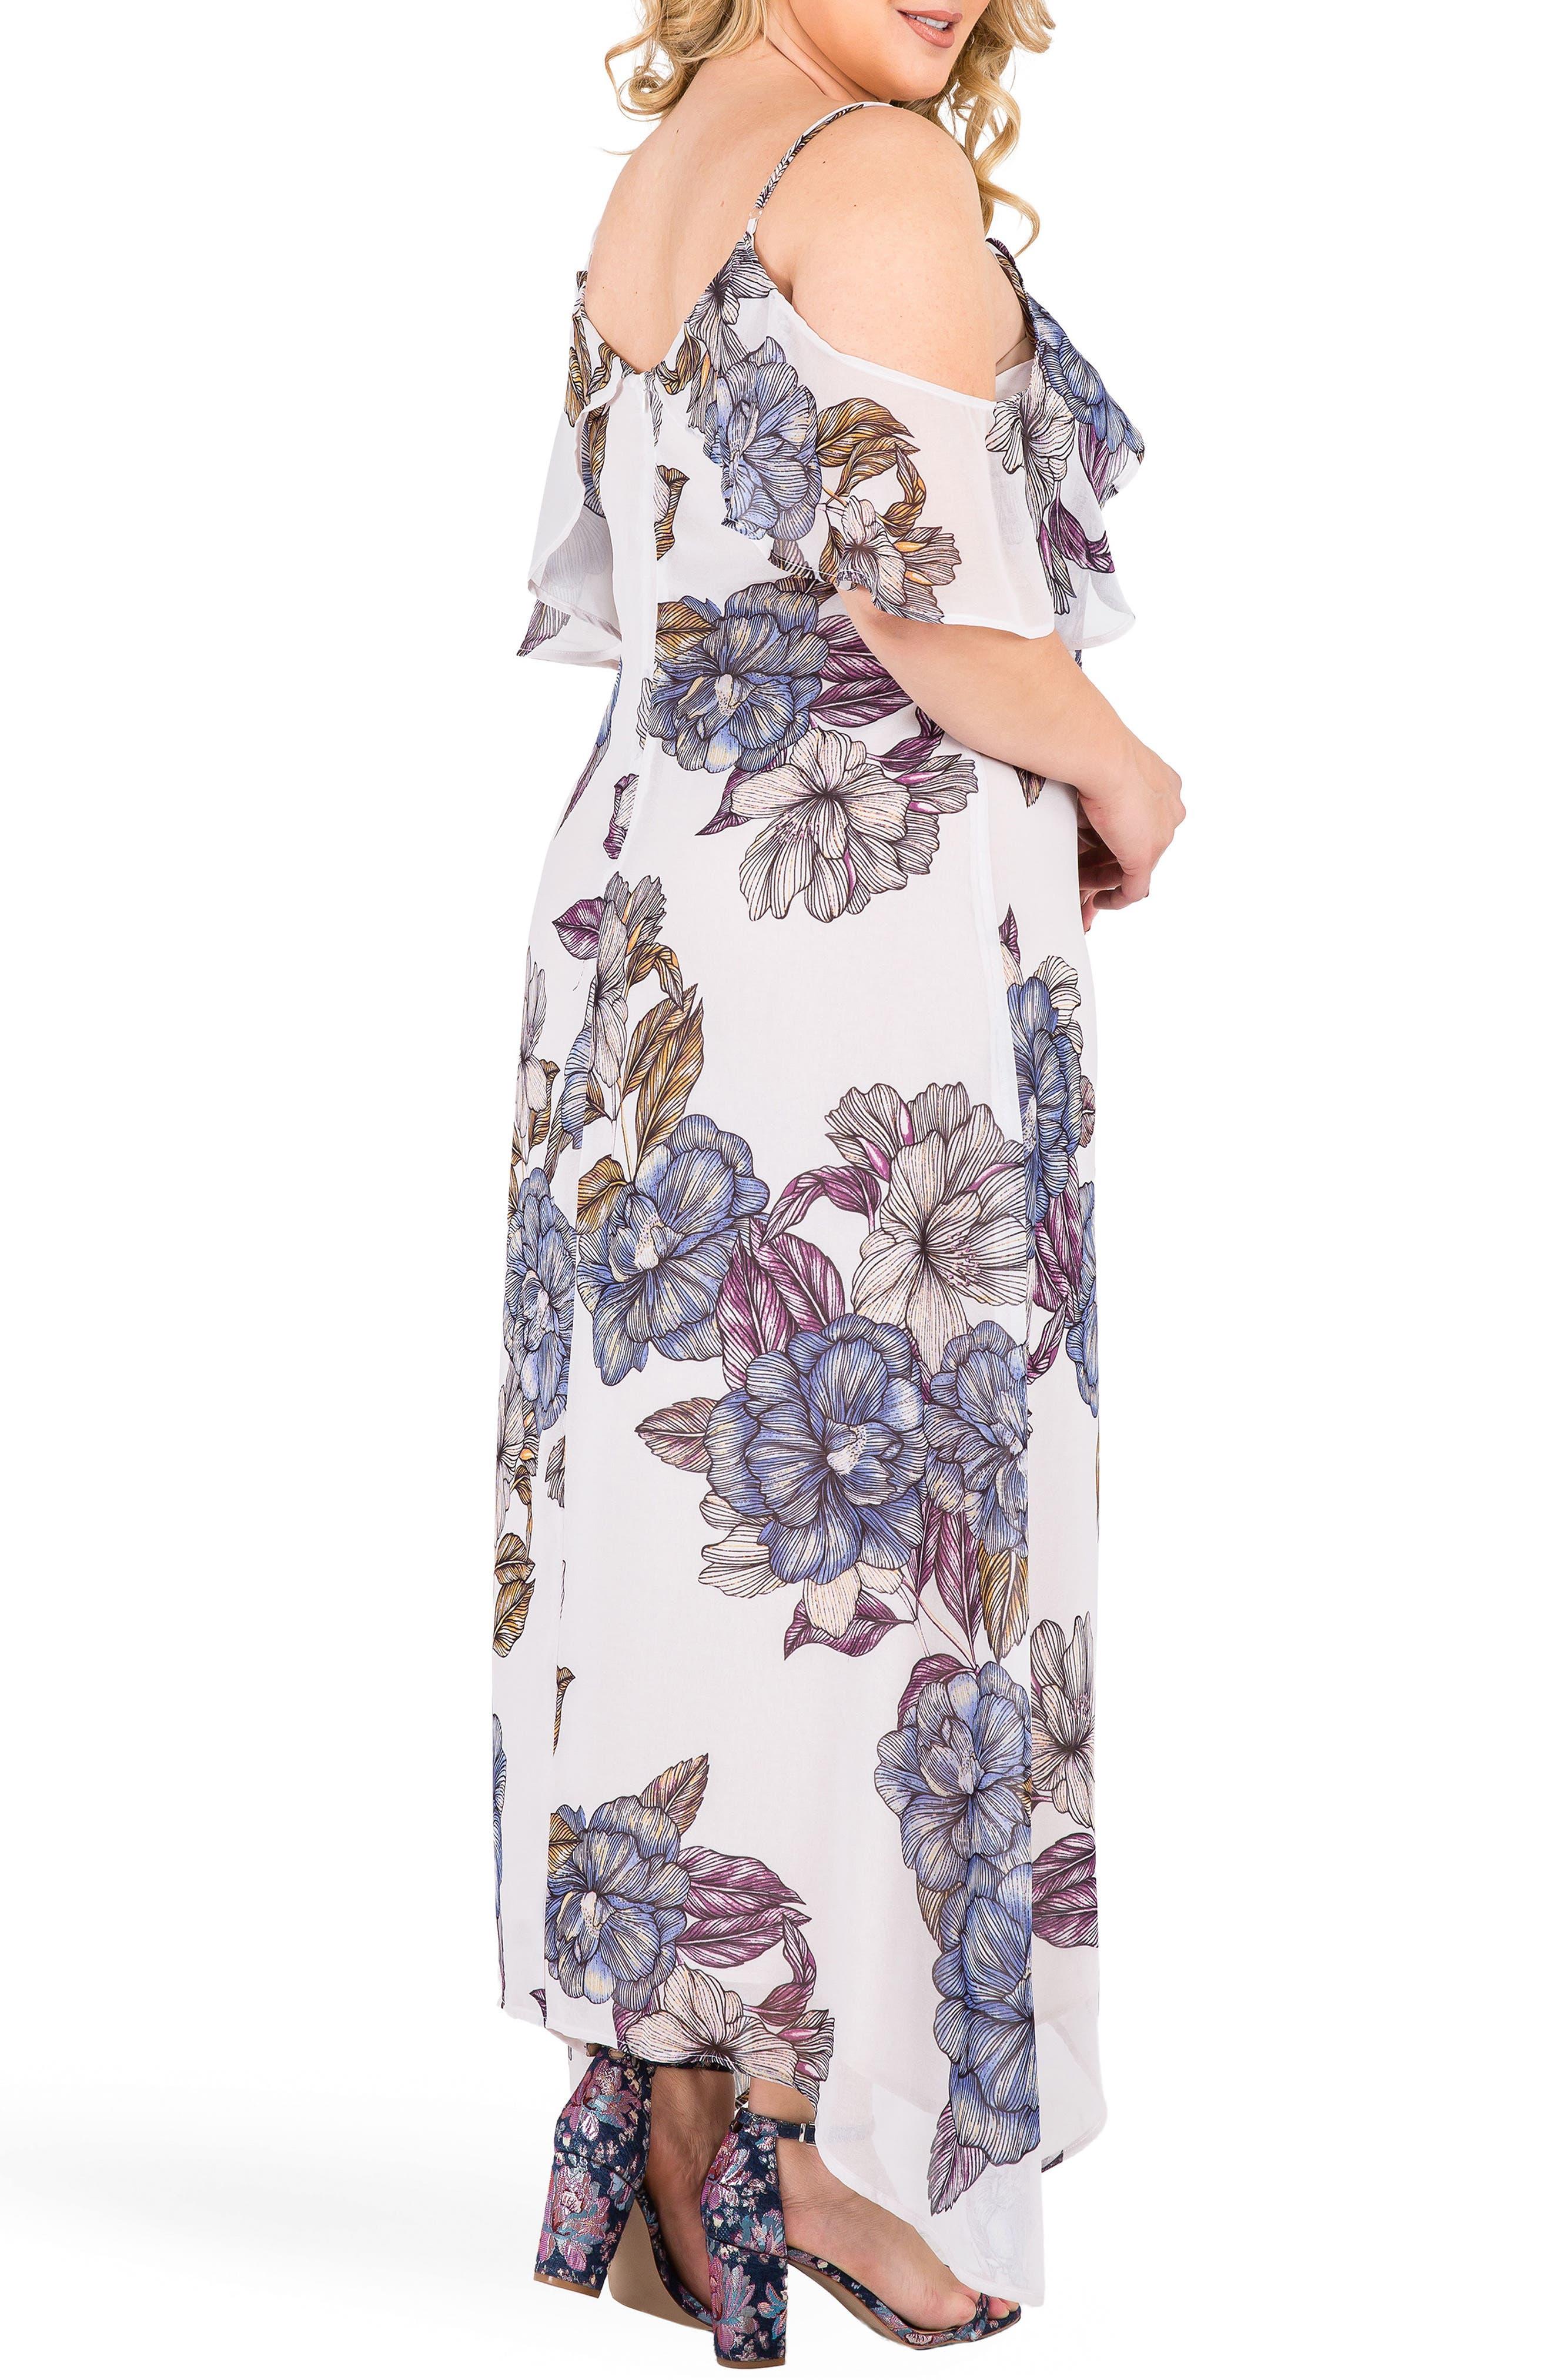 Matilda Floral Cold Shoulder Maxi Dress,                             Alternate thumbnail 3, color,                             LIGHT GRAY FLORAL PRINT